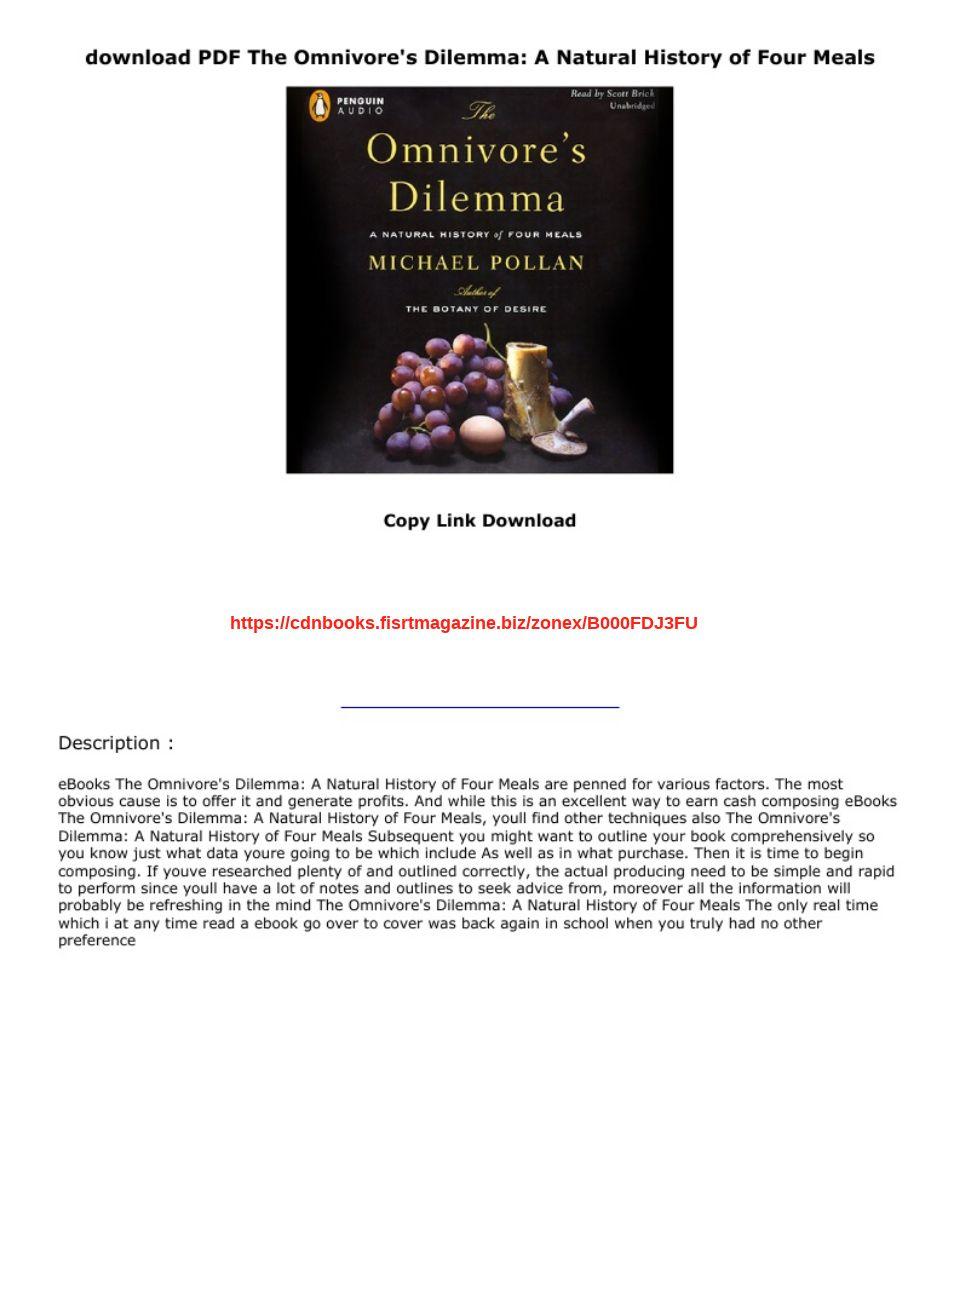 The Omnivore's Dilemma Pdf